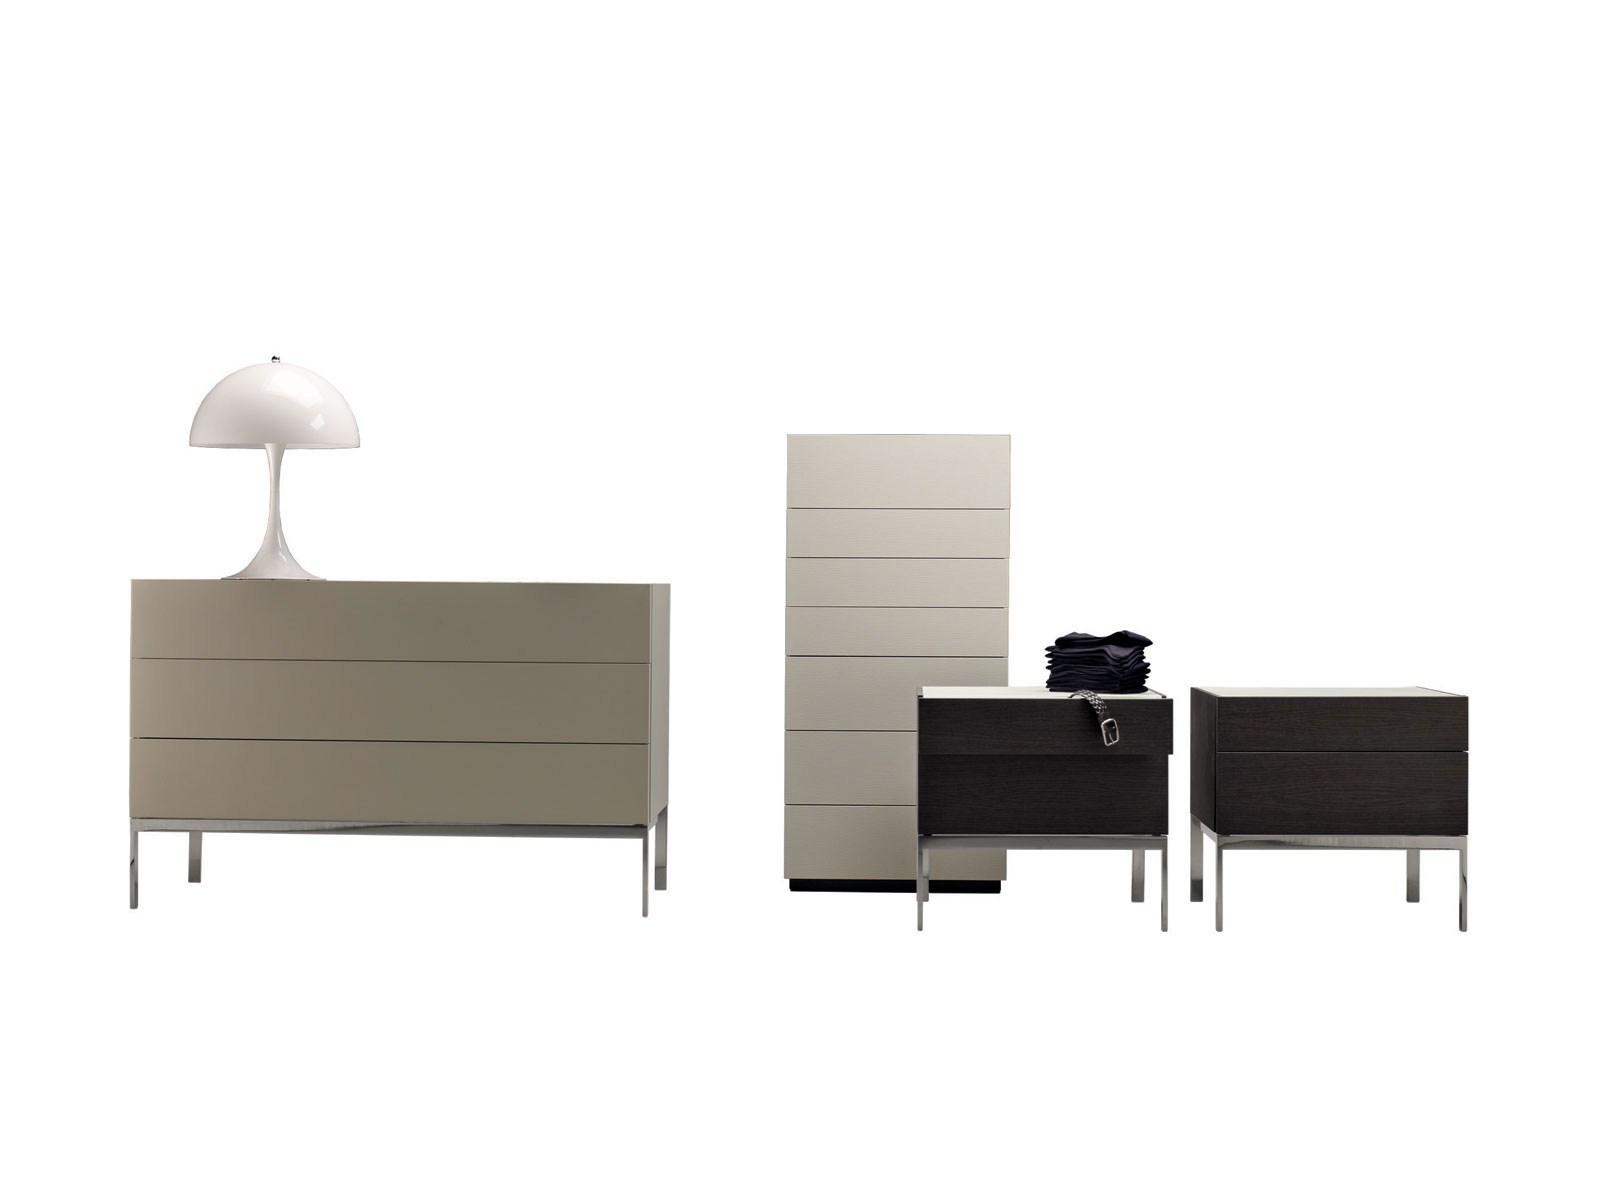 molteni c 606 storage units. Black Bedroom Furniture Sets. Home Design Ideas